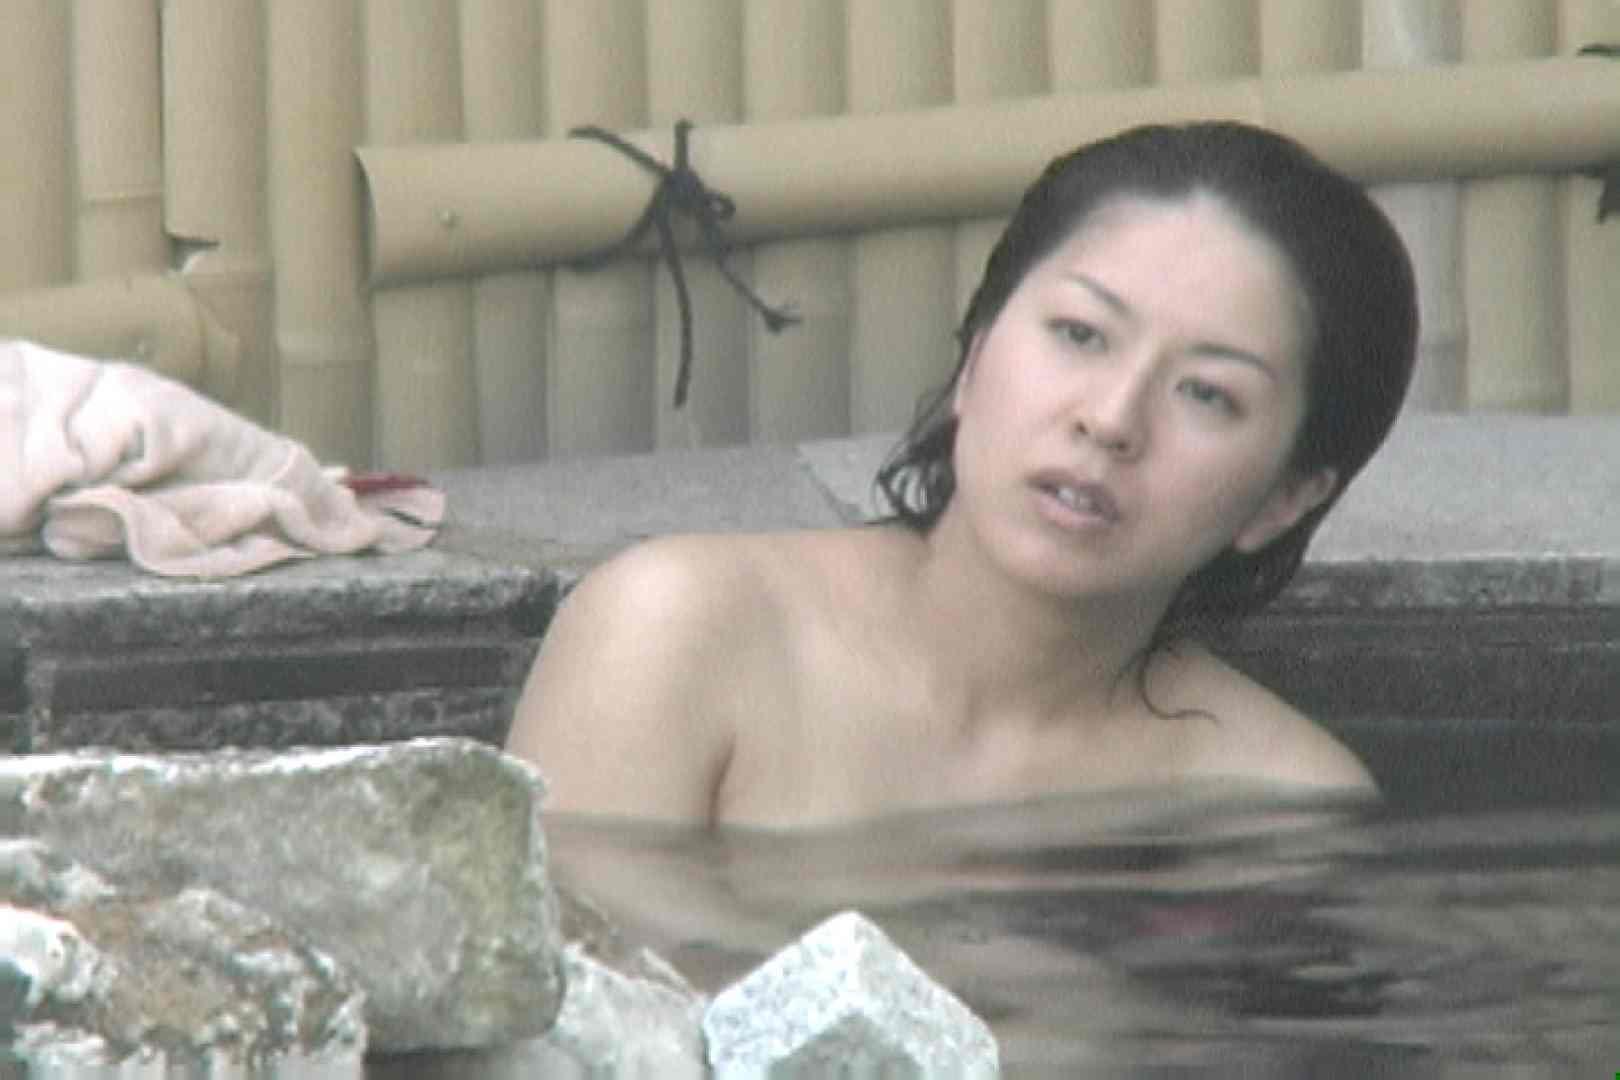 Aquaな露天風呂Vol.694 盗撮 | OLエロ画像  110PICs 97